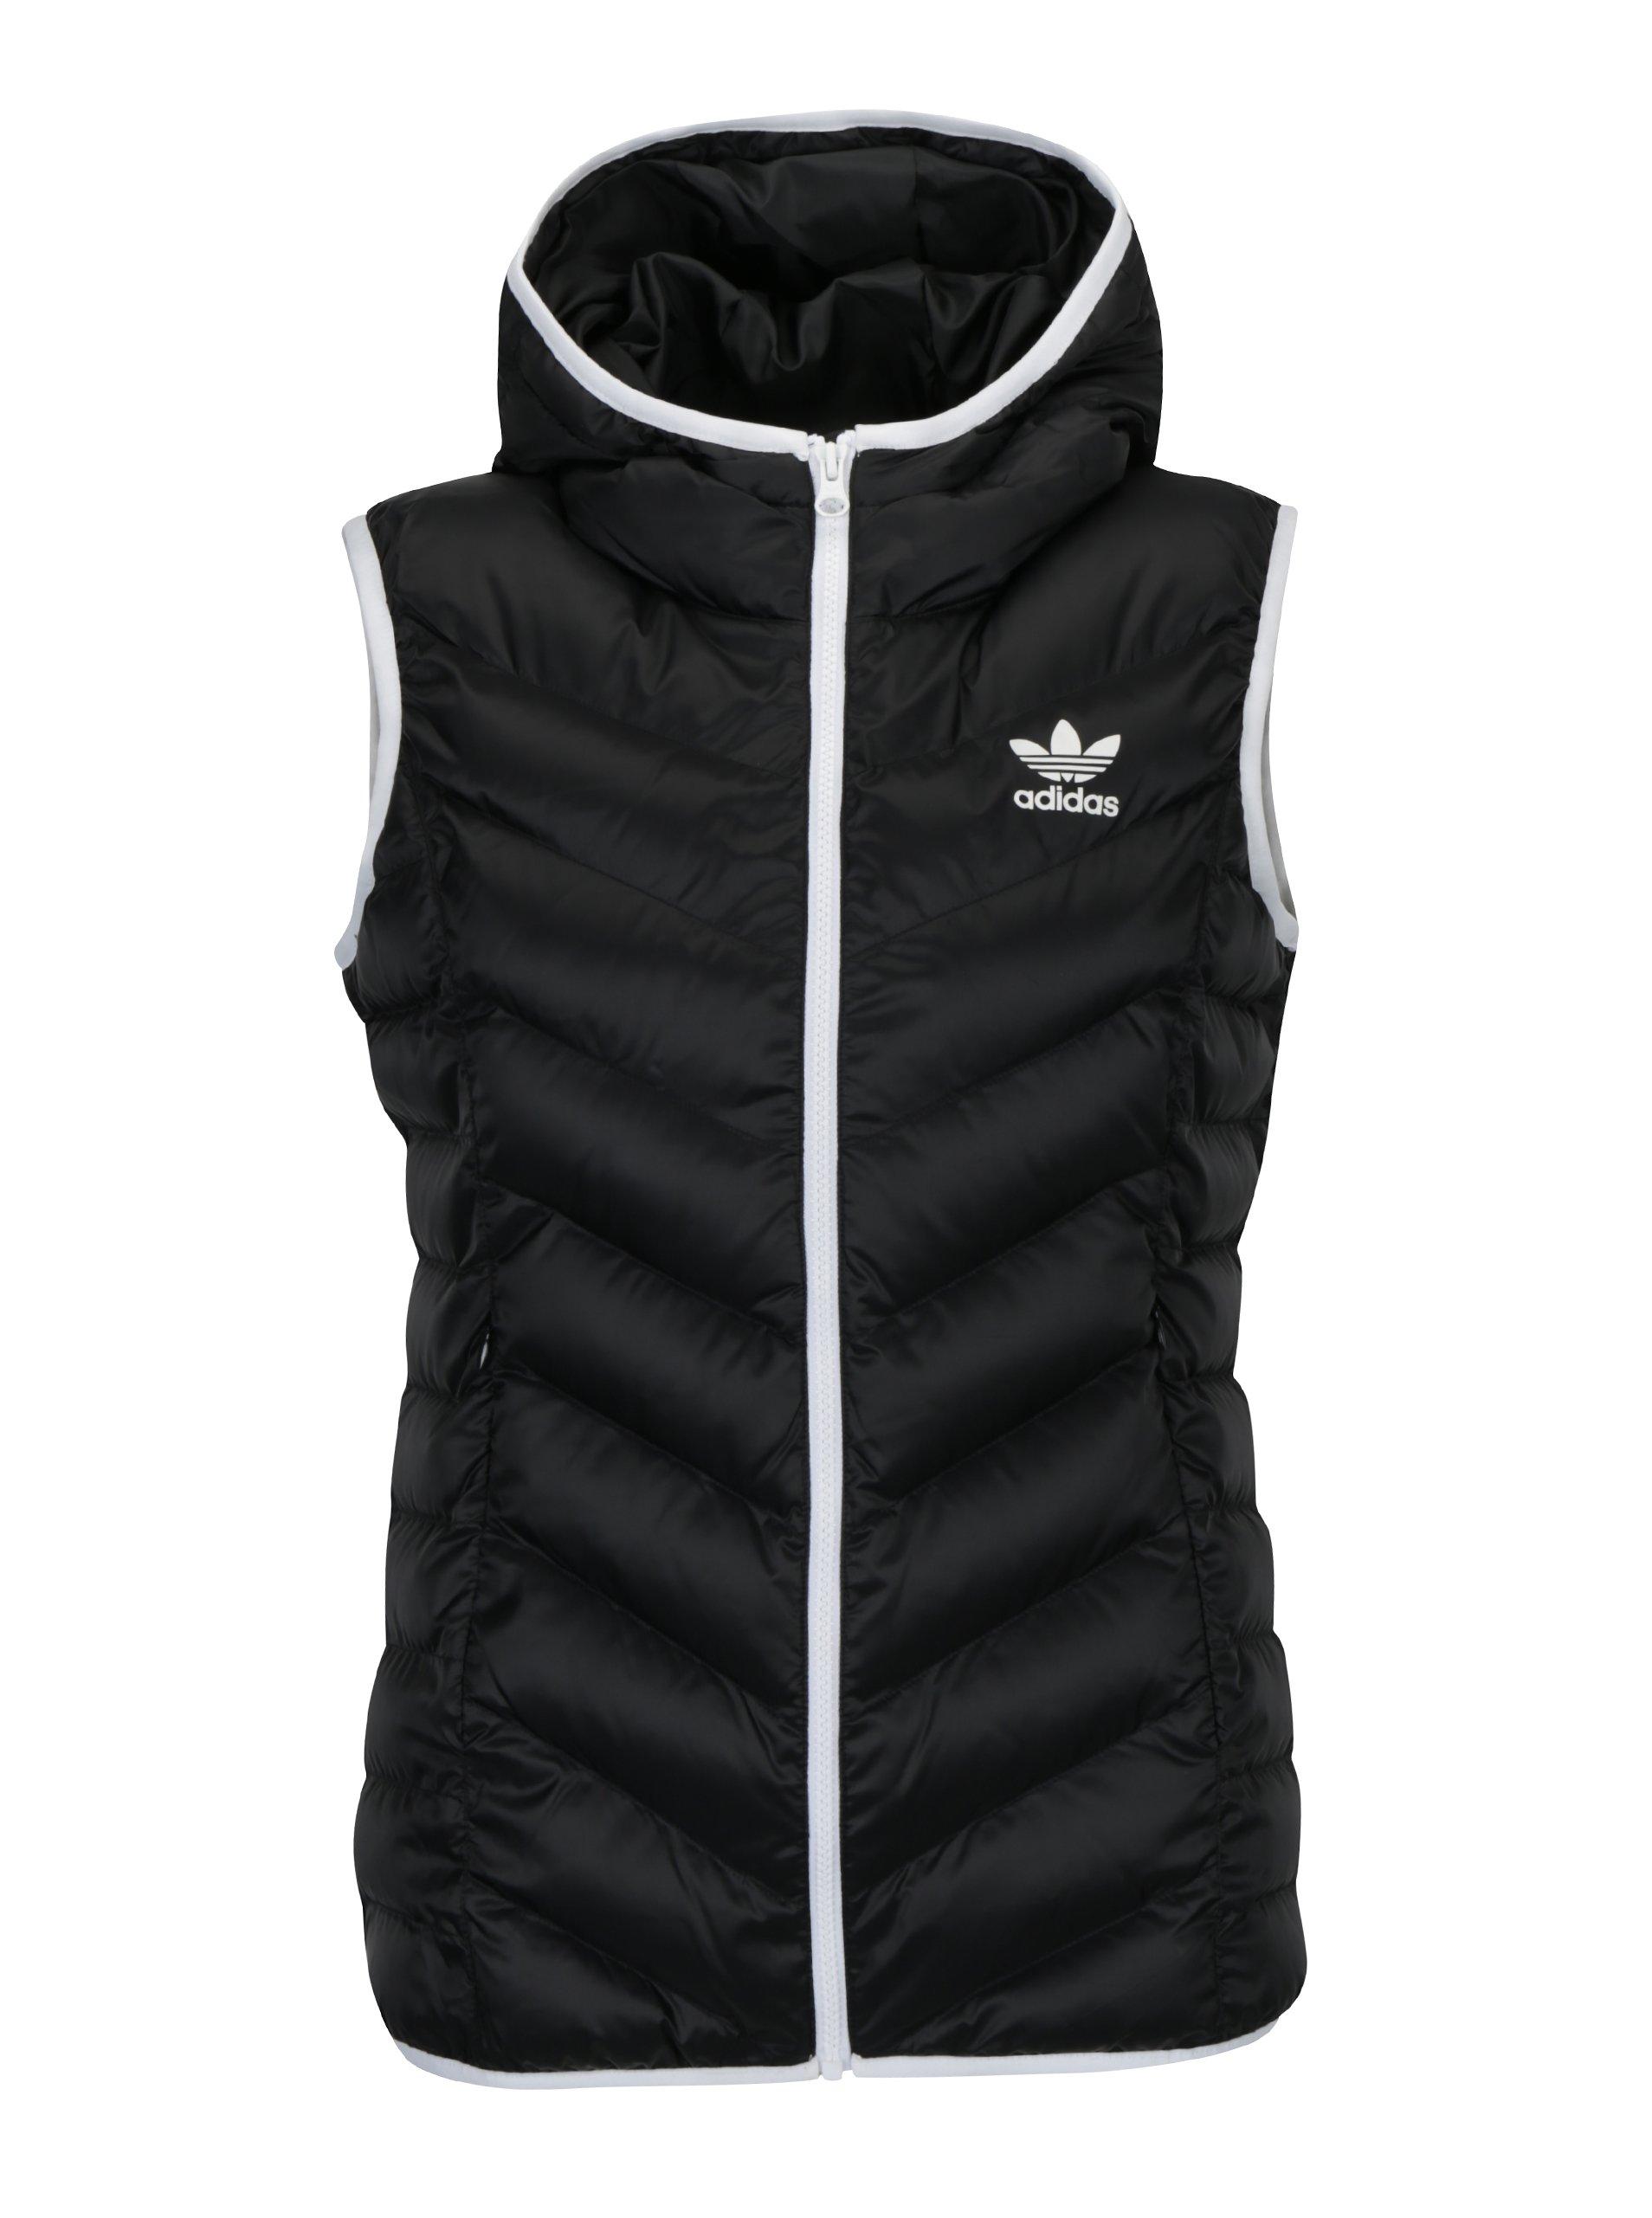 Čierna dámska prešívaná vesta adidas Originals